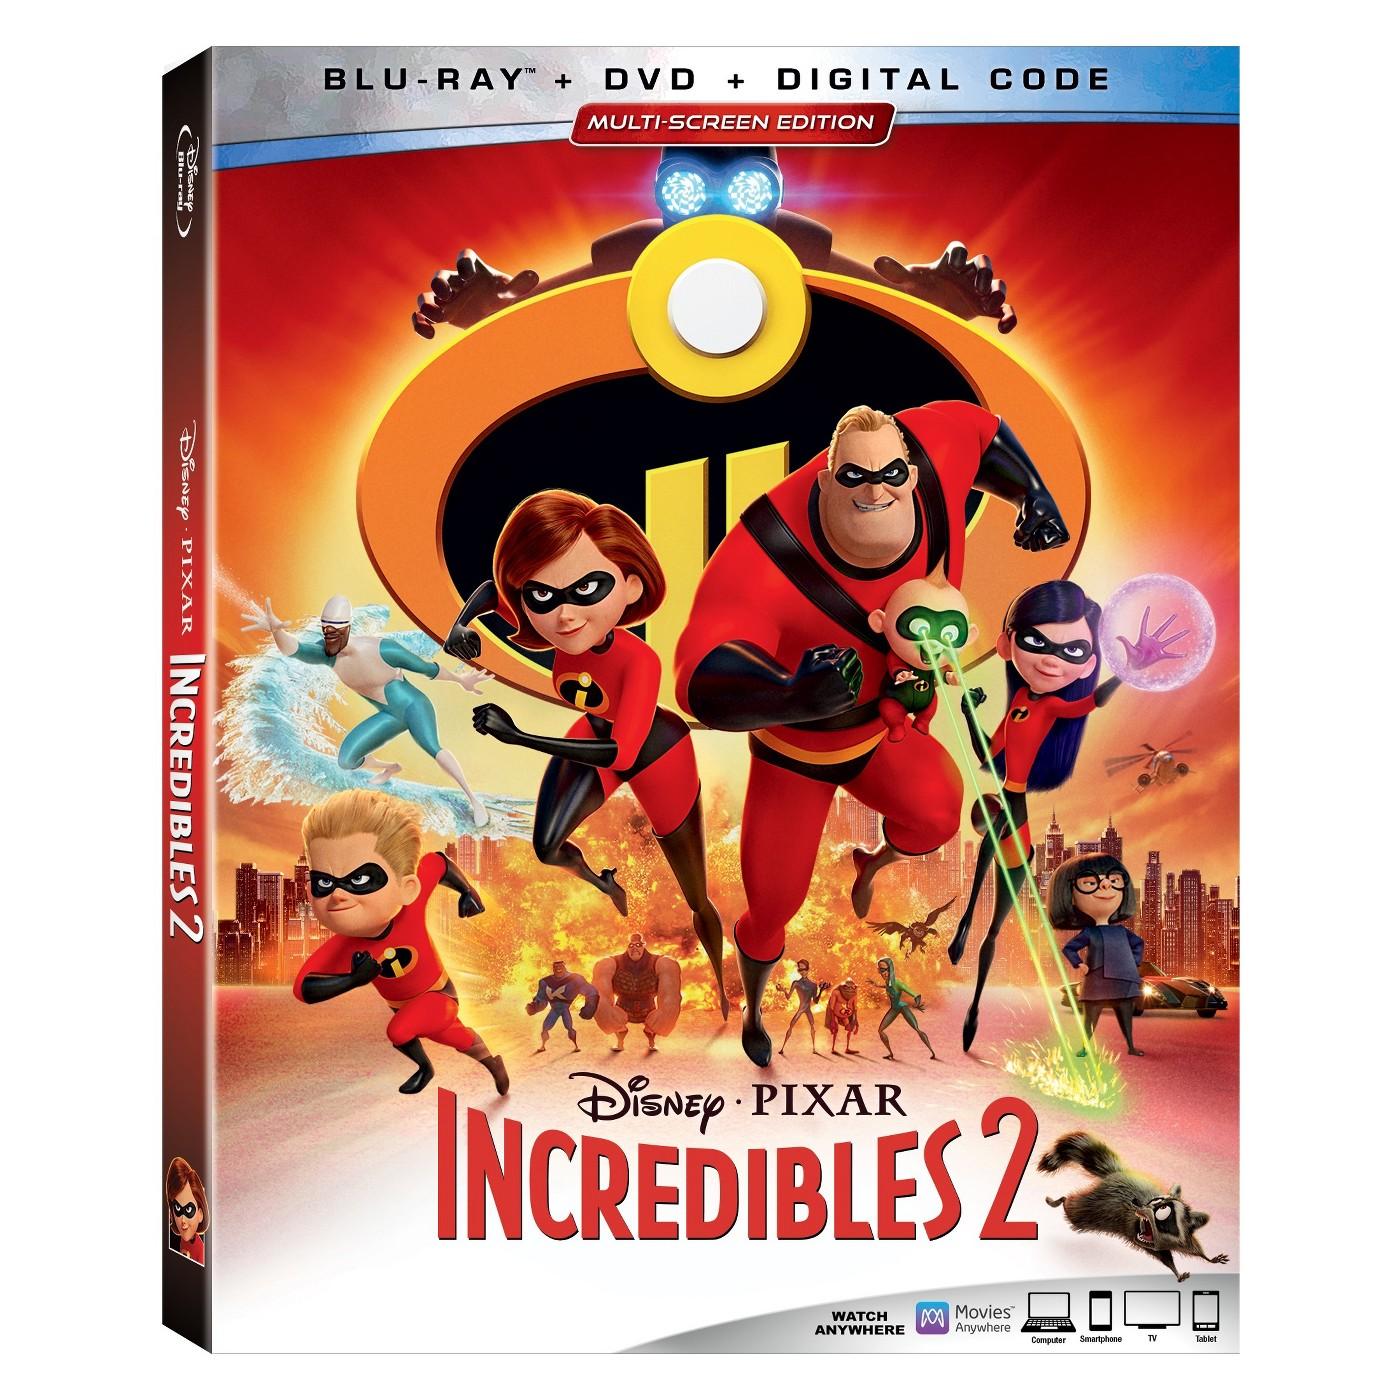 Incredibles 2 (2 Blu-Ray) - image 1 of 1